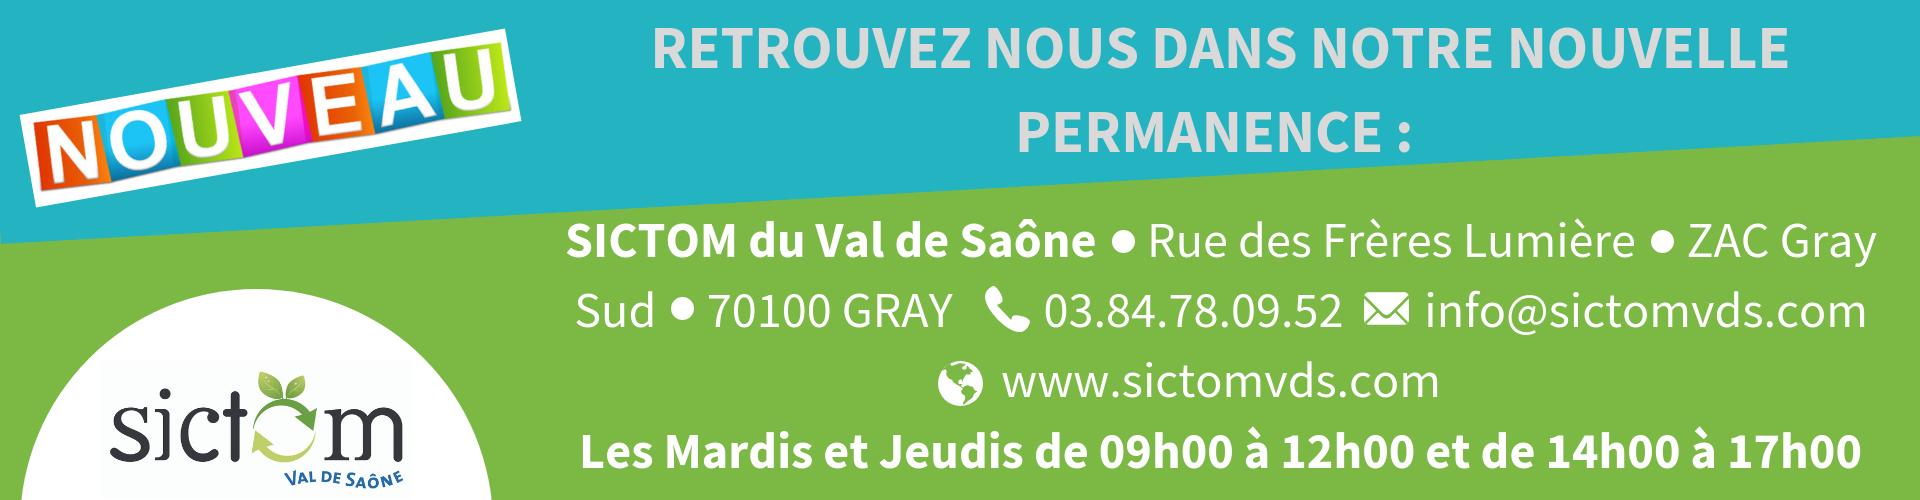 Ouverture_Gray1